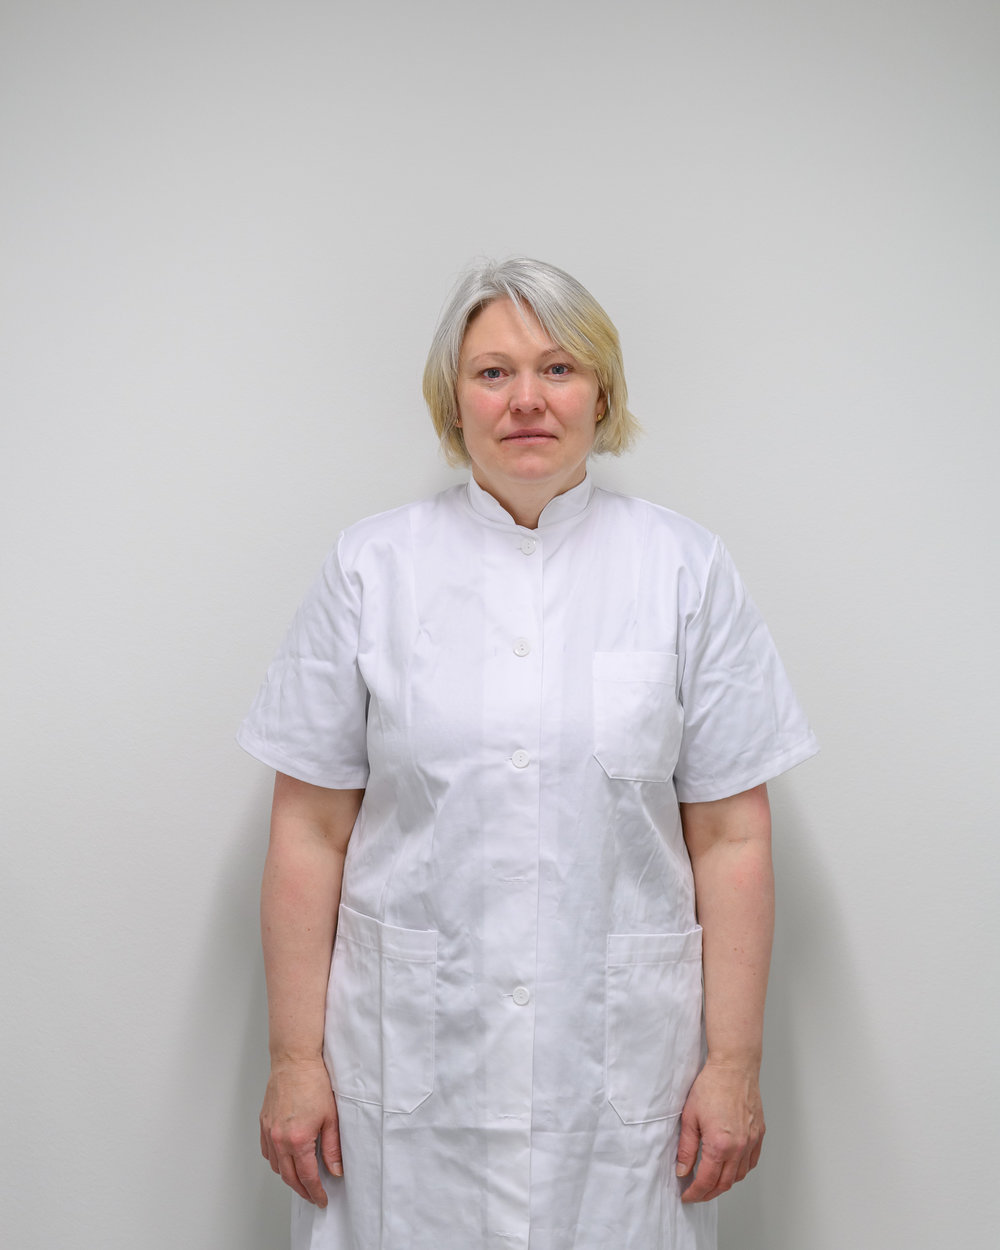 Belinda Nielsen, head of the Sensory Laboratory at the Department of Food Science